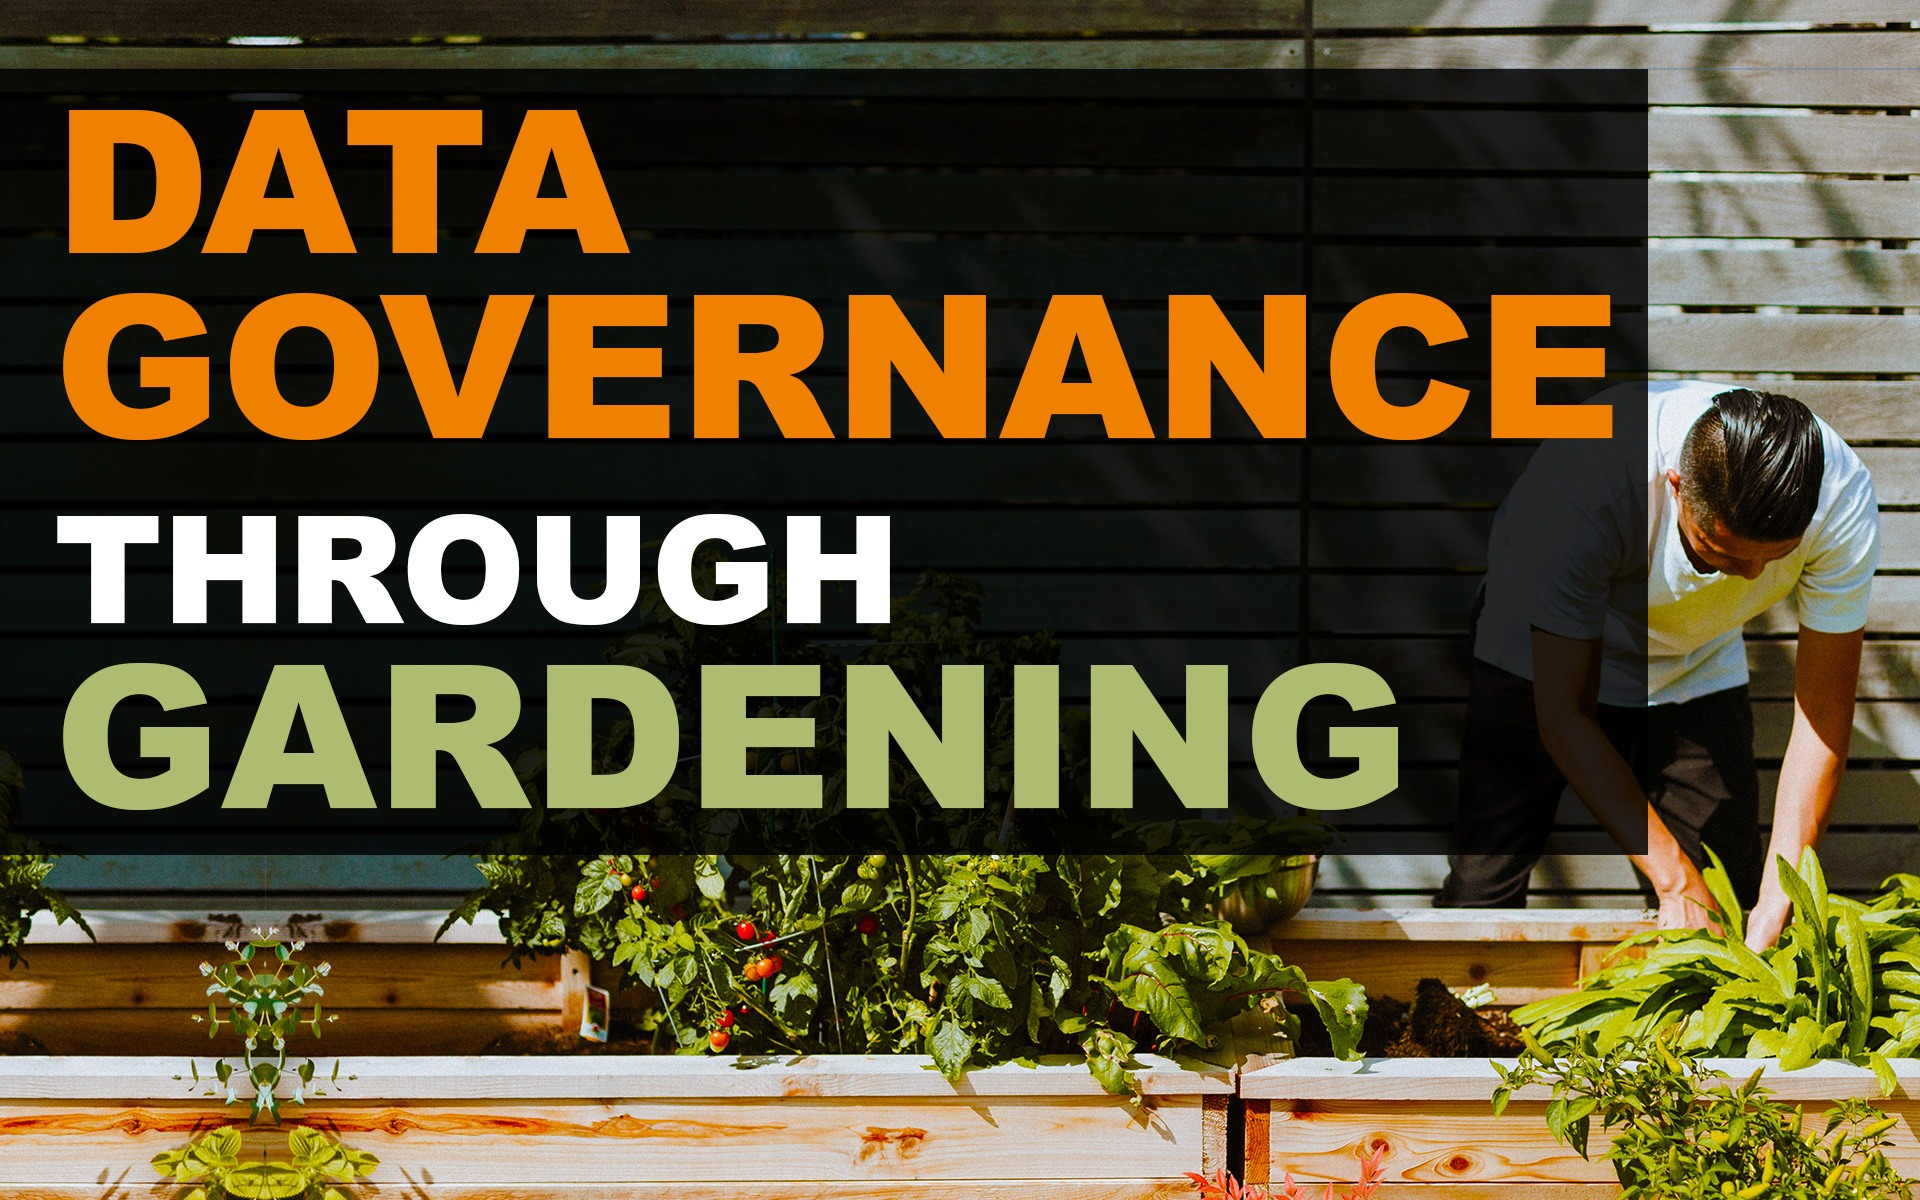 data governance implementation analogy through gardening